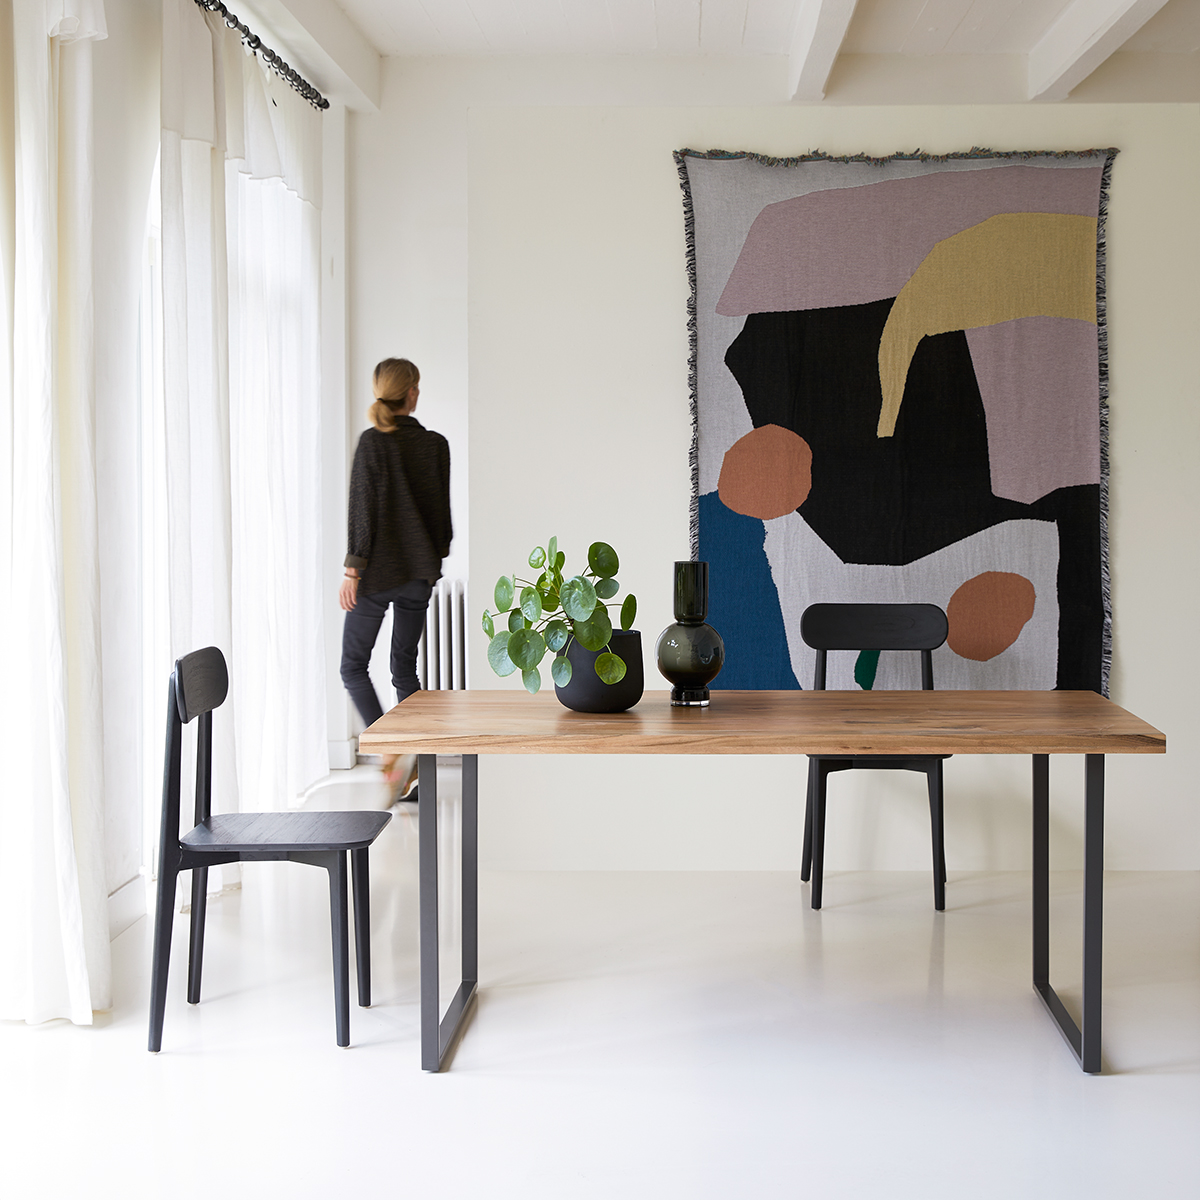 Temis solid acacia and metal Table, seats 4/6